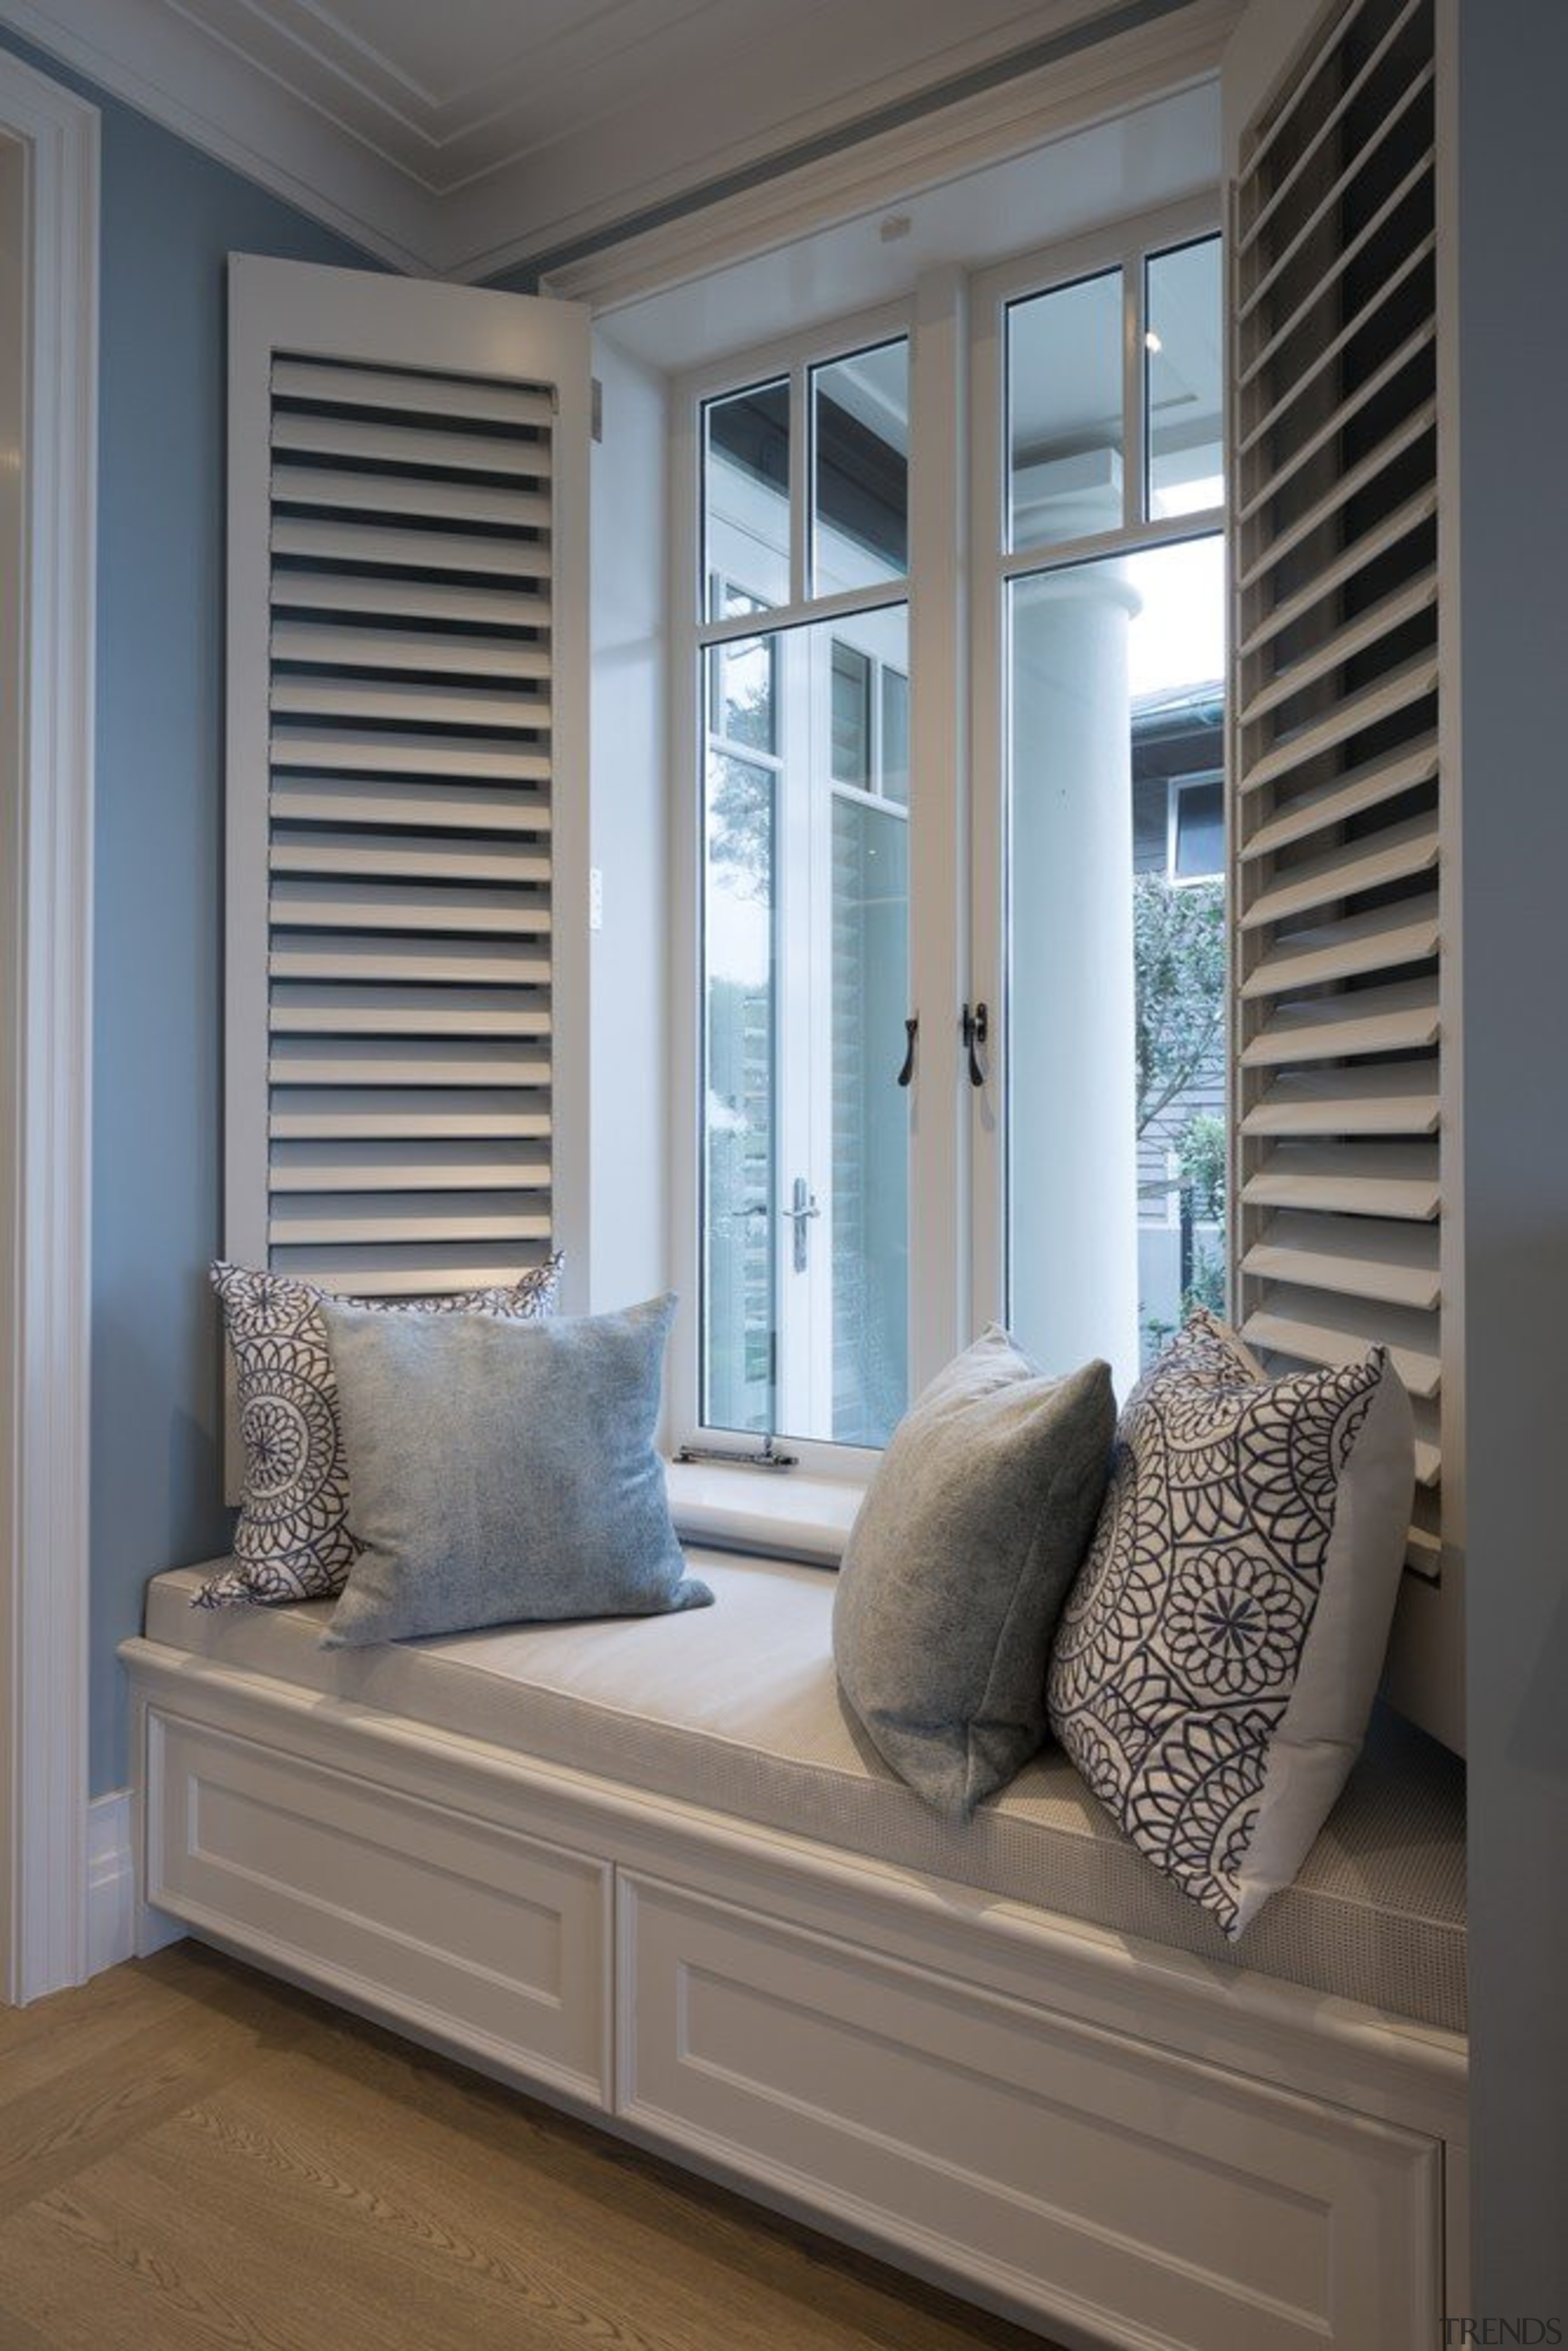 Window seat - Window seat - curtain | curtain, door, floor, furniture, home, interior design, living room, sash window, shade, window, window blind, window covering, window treatment, wood, gray